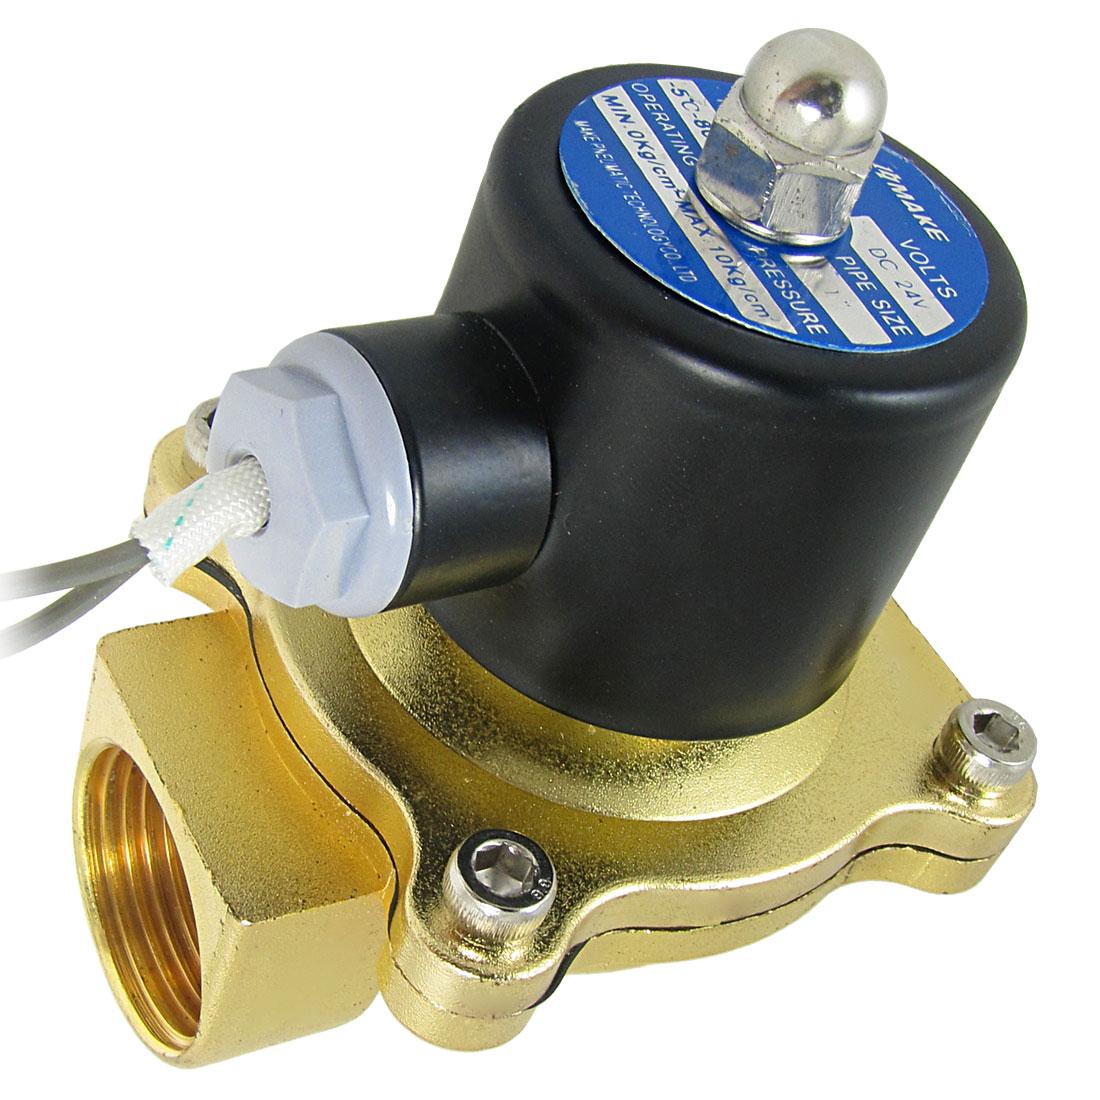 DC 24V 1BSP Brass Thread Water Control Solenoid Valve